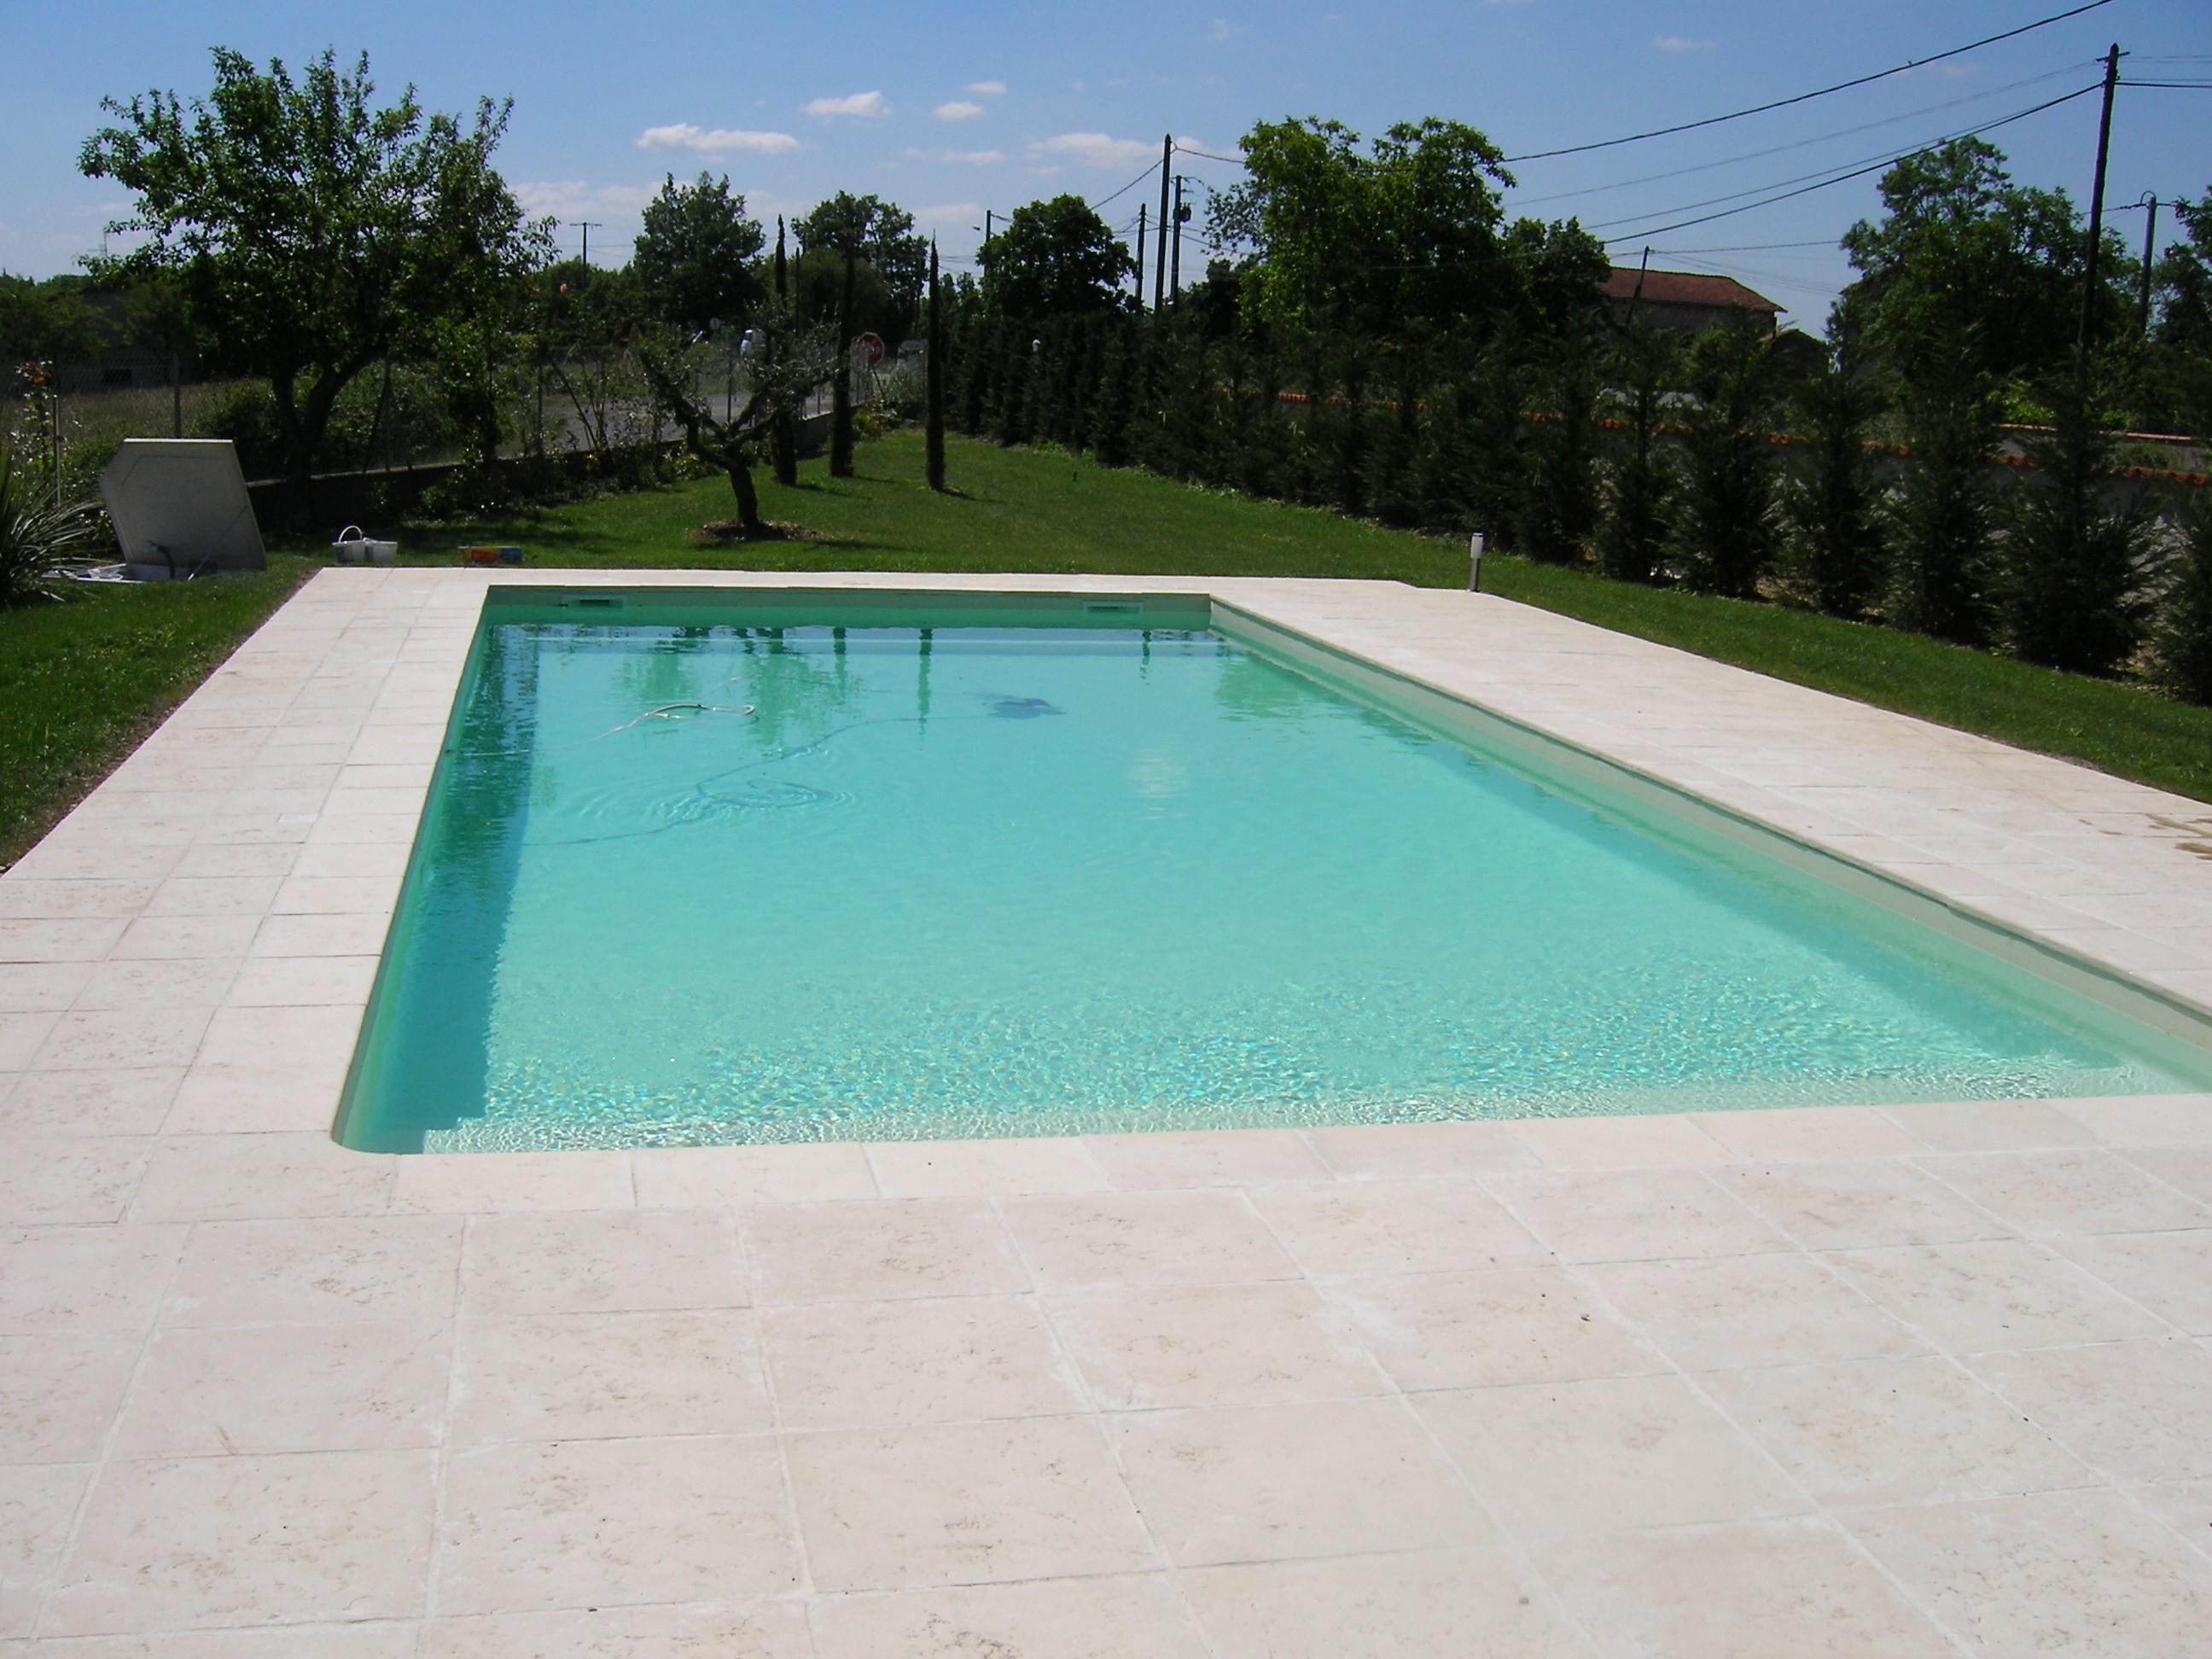 piscine coque polyester california 925 coque piscine direct usine. Black Bedroom Furniture Sets. Home Design Ideas